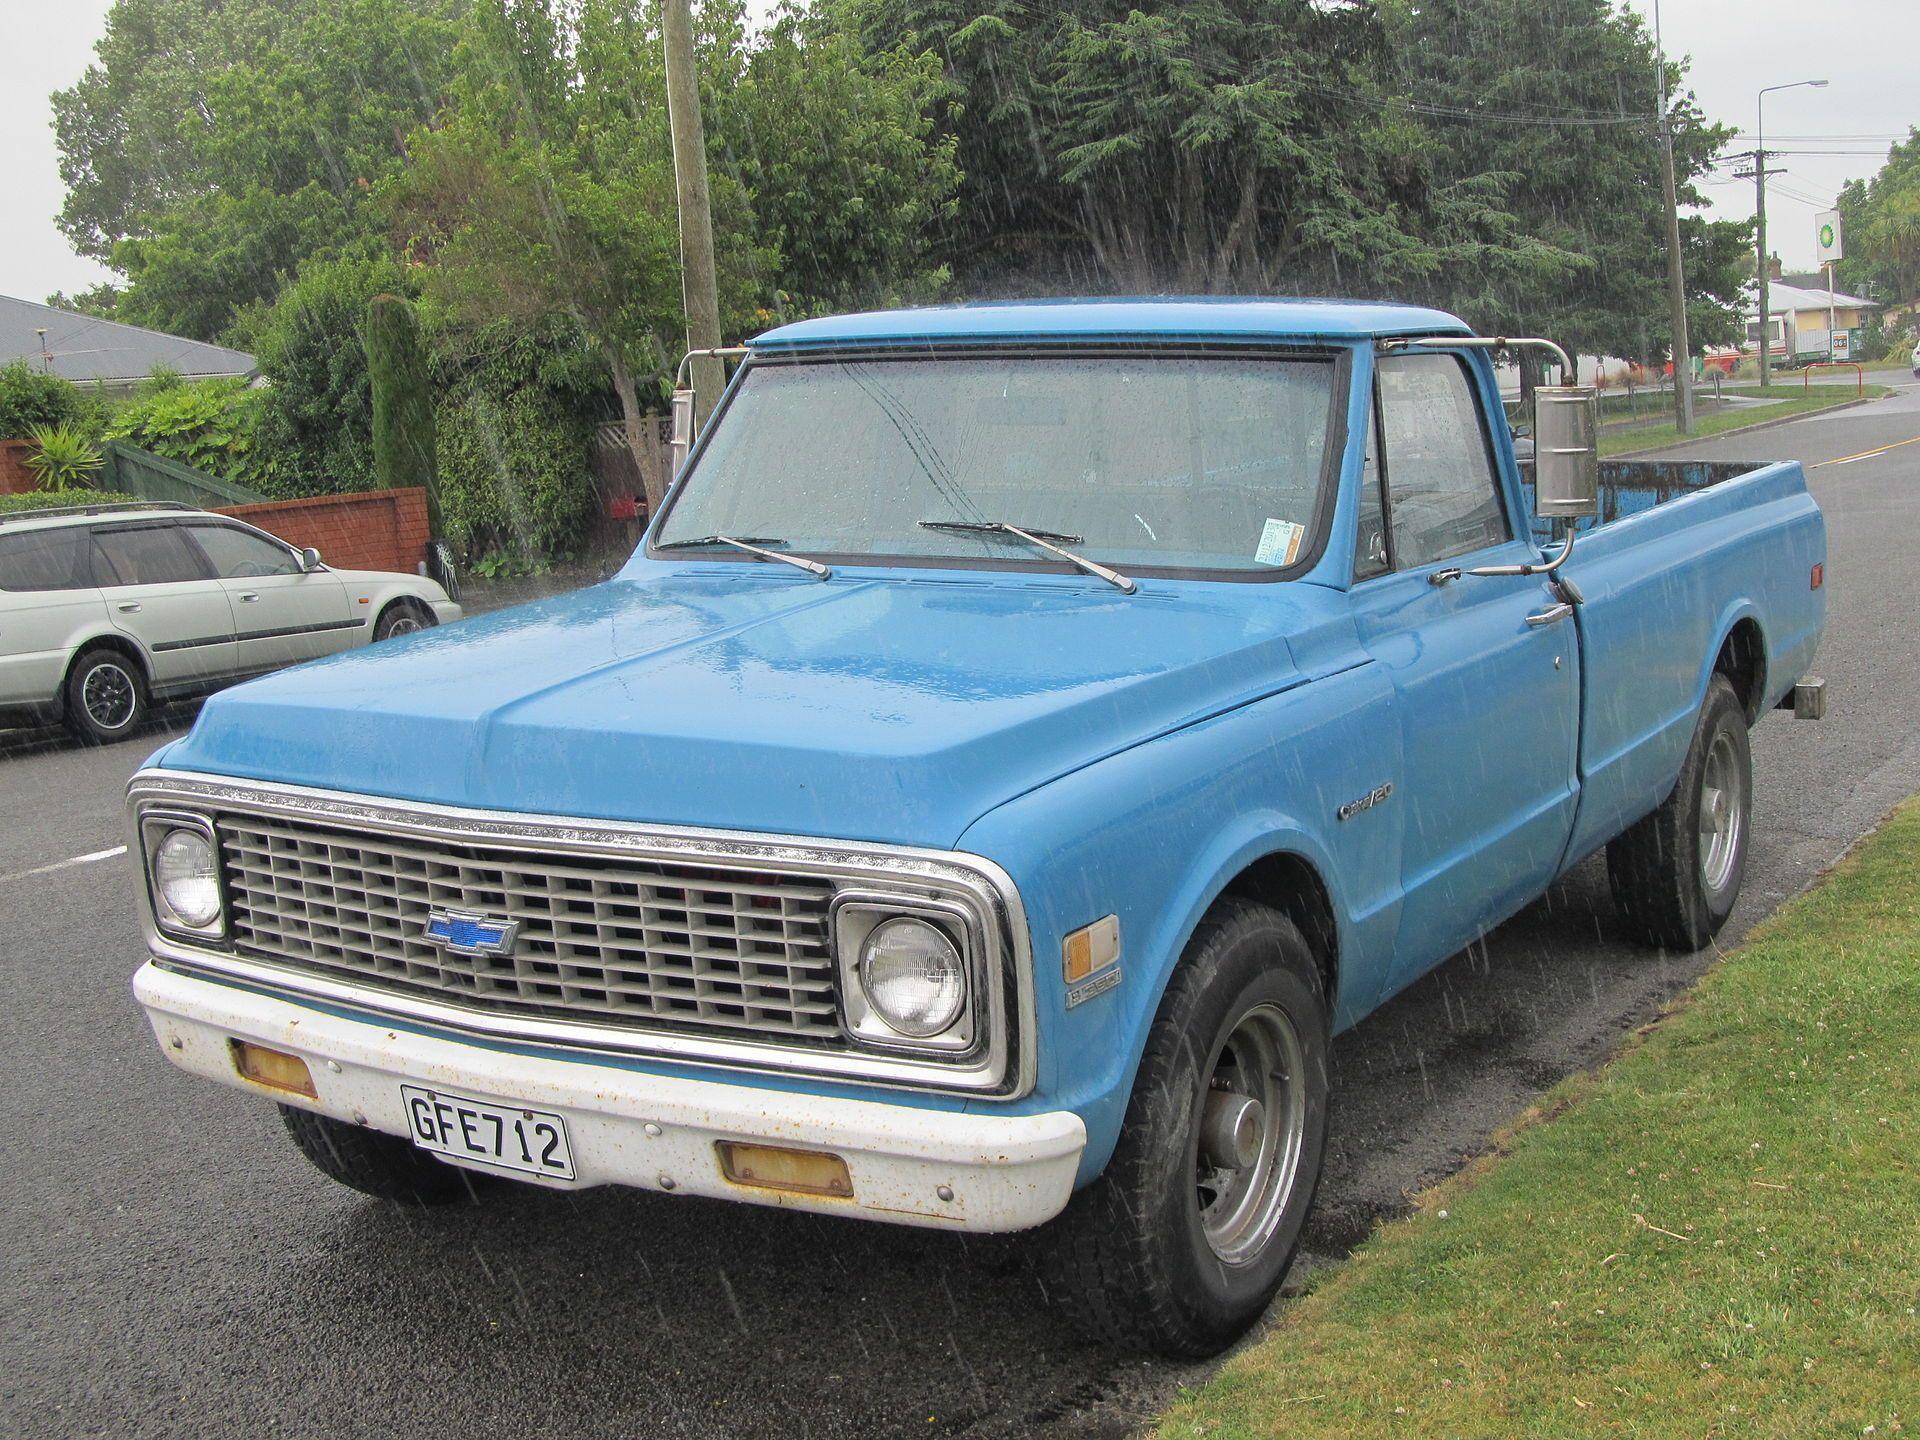 1971 Chevrolet C 20 Custom Chevrolet C K Wikipedia Chevrolet